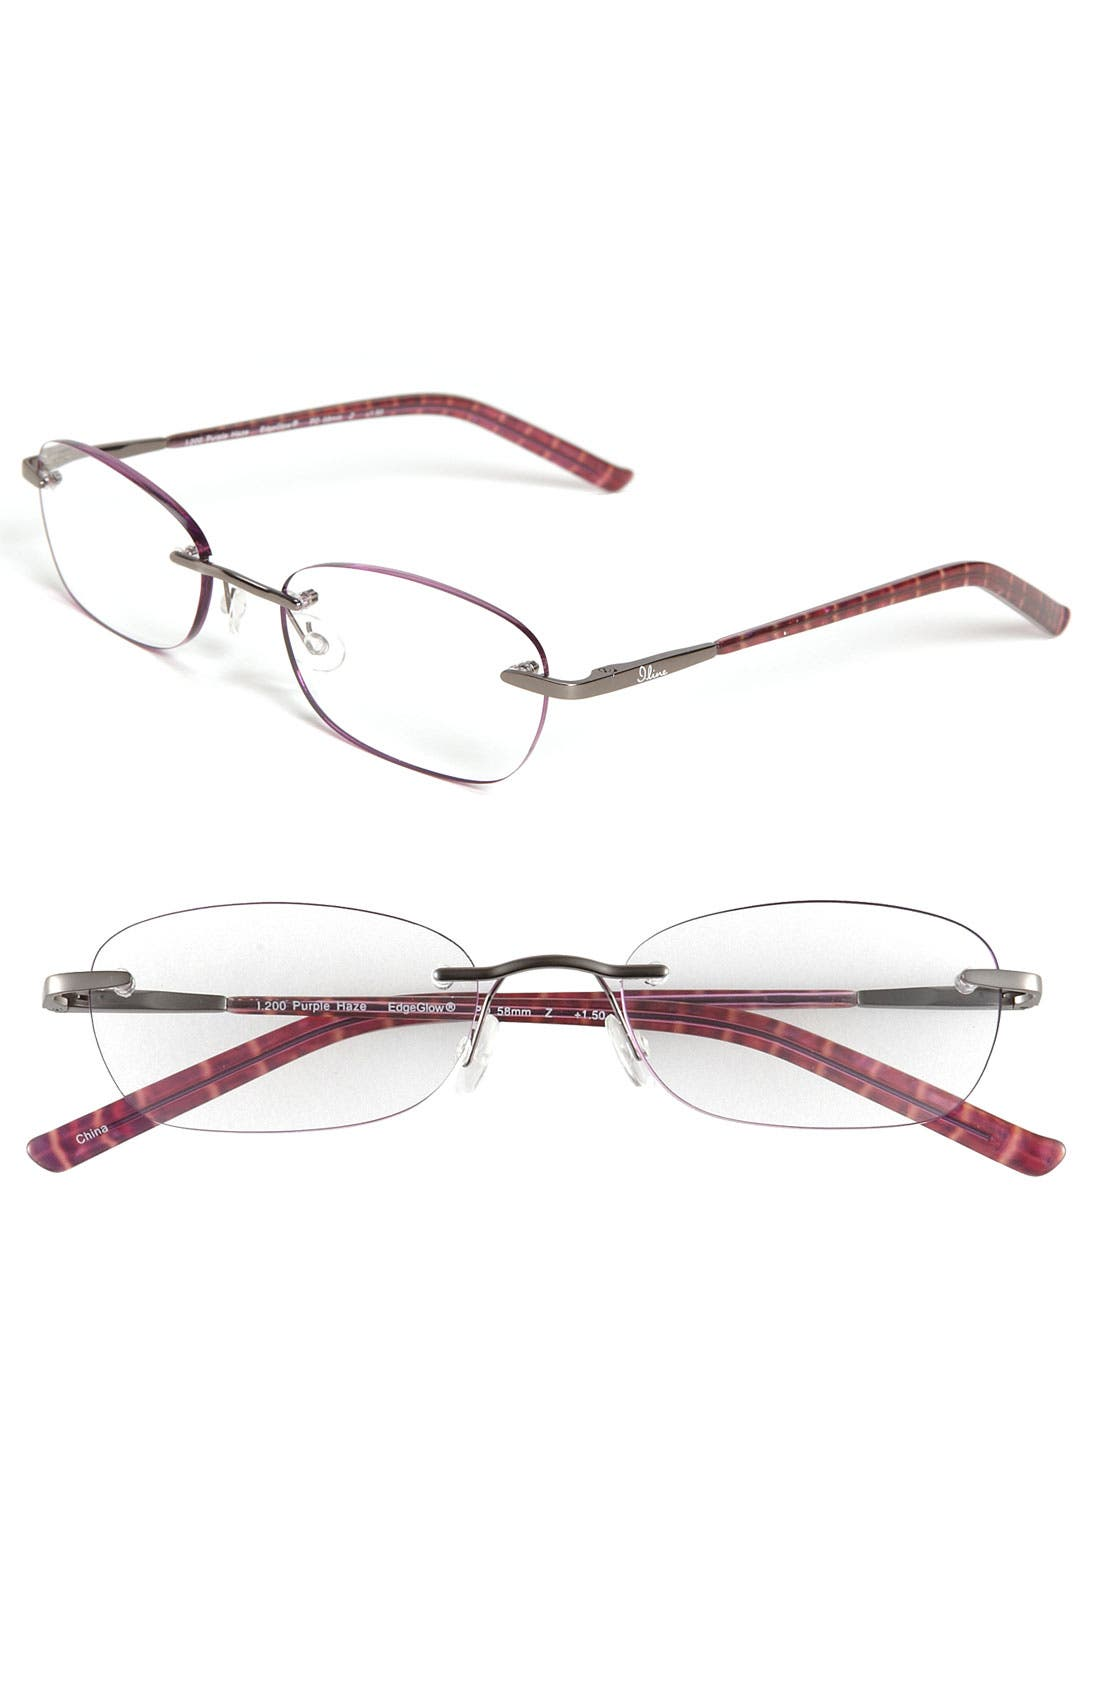 Alternate Image 1 Selected - I Line Eyewear 'Purple Haze' EdgeGlow® Reading Glasses